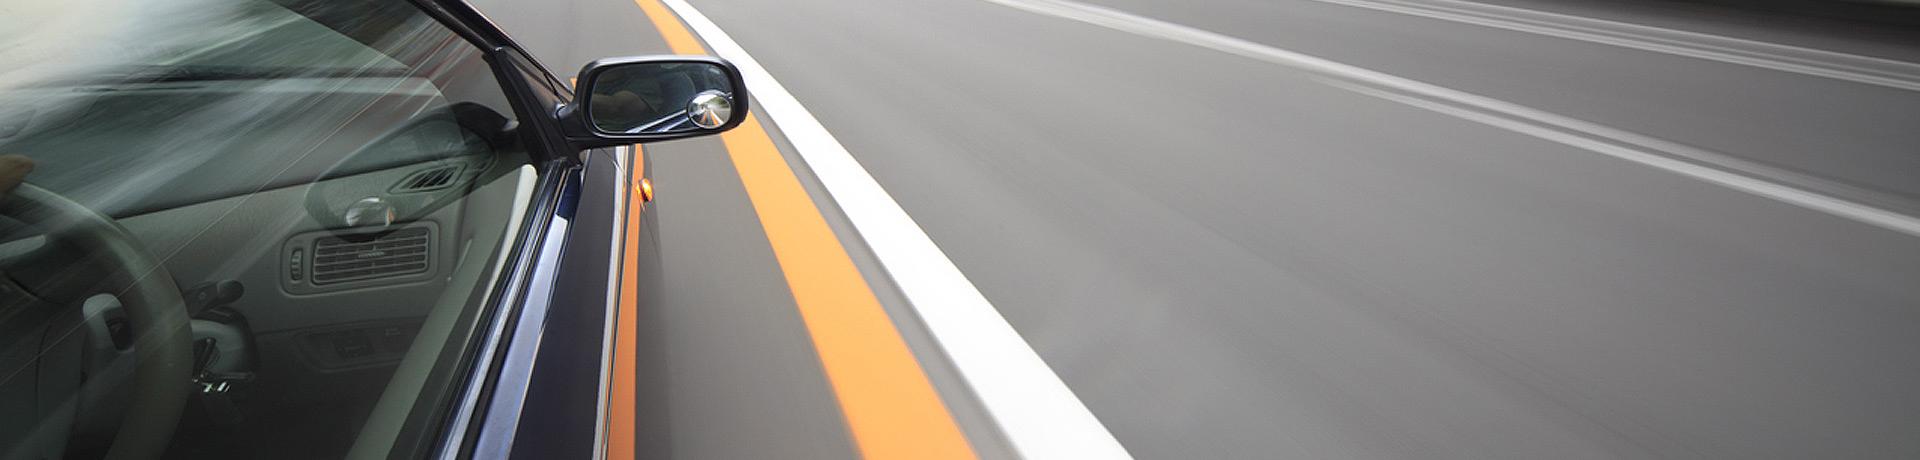 Orange County Teen Drivers - Wheely Good Driving School